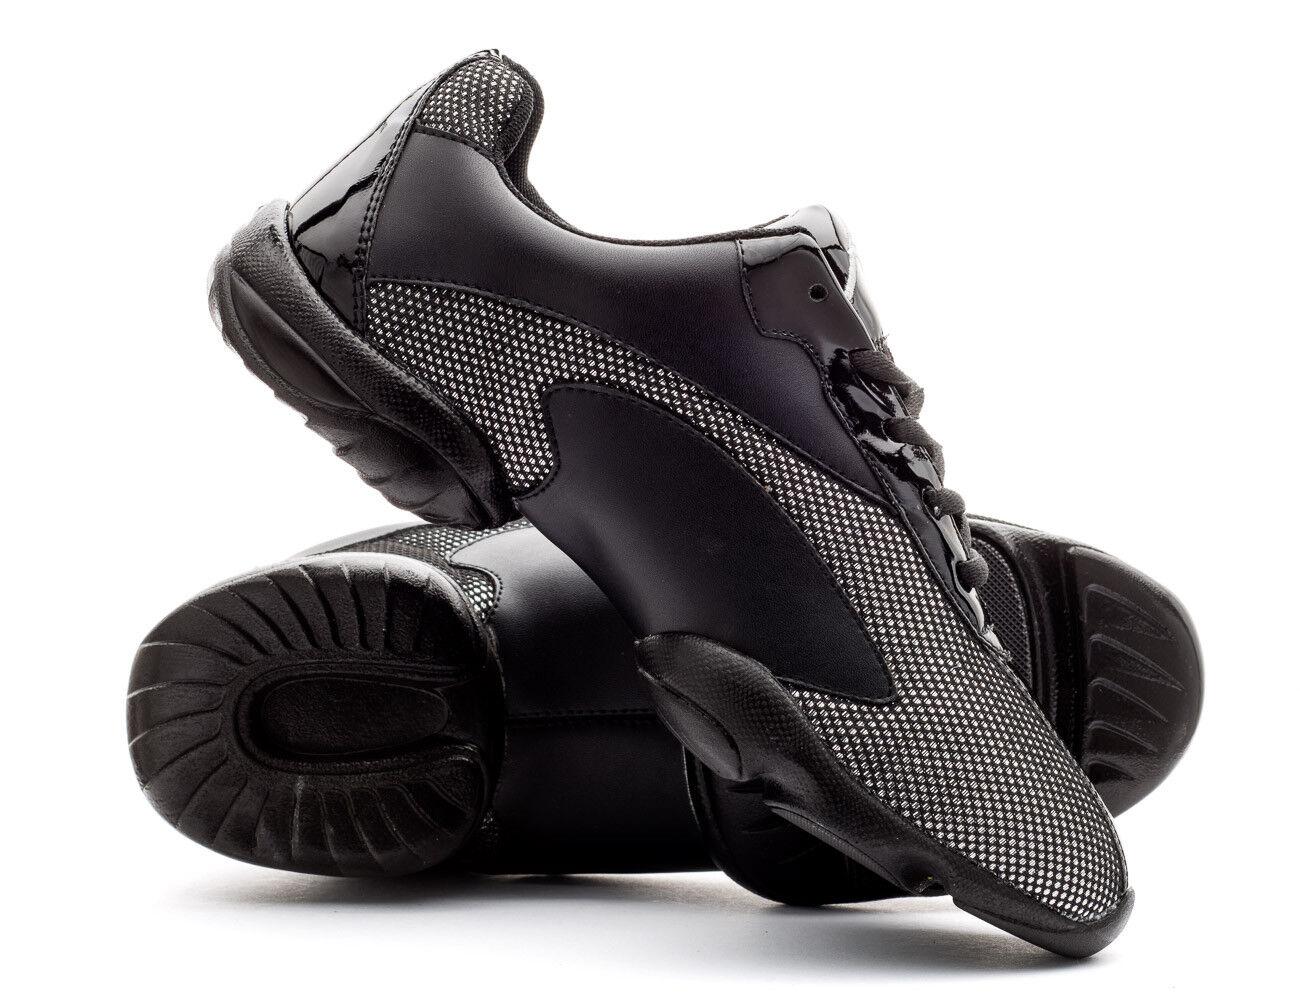 Black & Silver Sparkly Split Sole Dance Practice Shoes Sneakers Trainers Katz